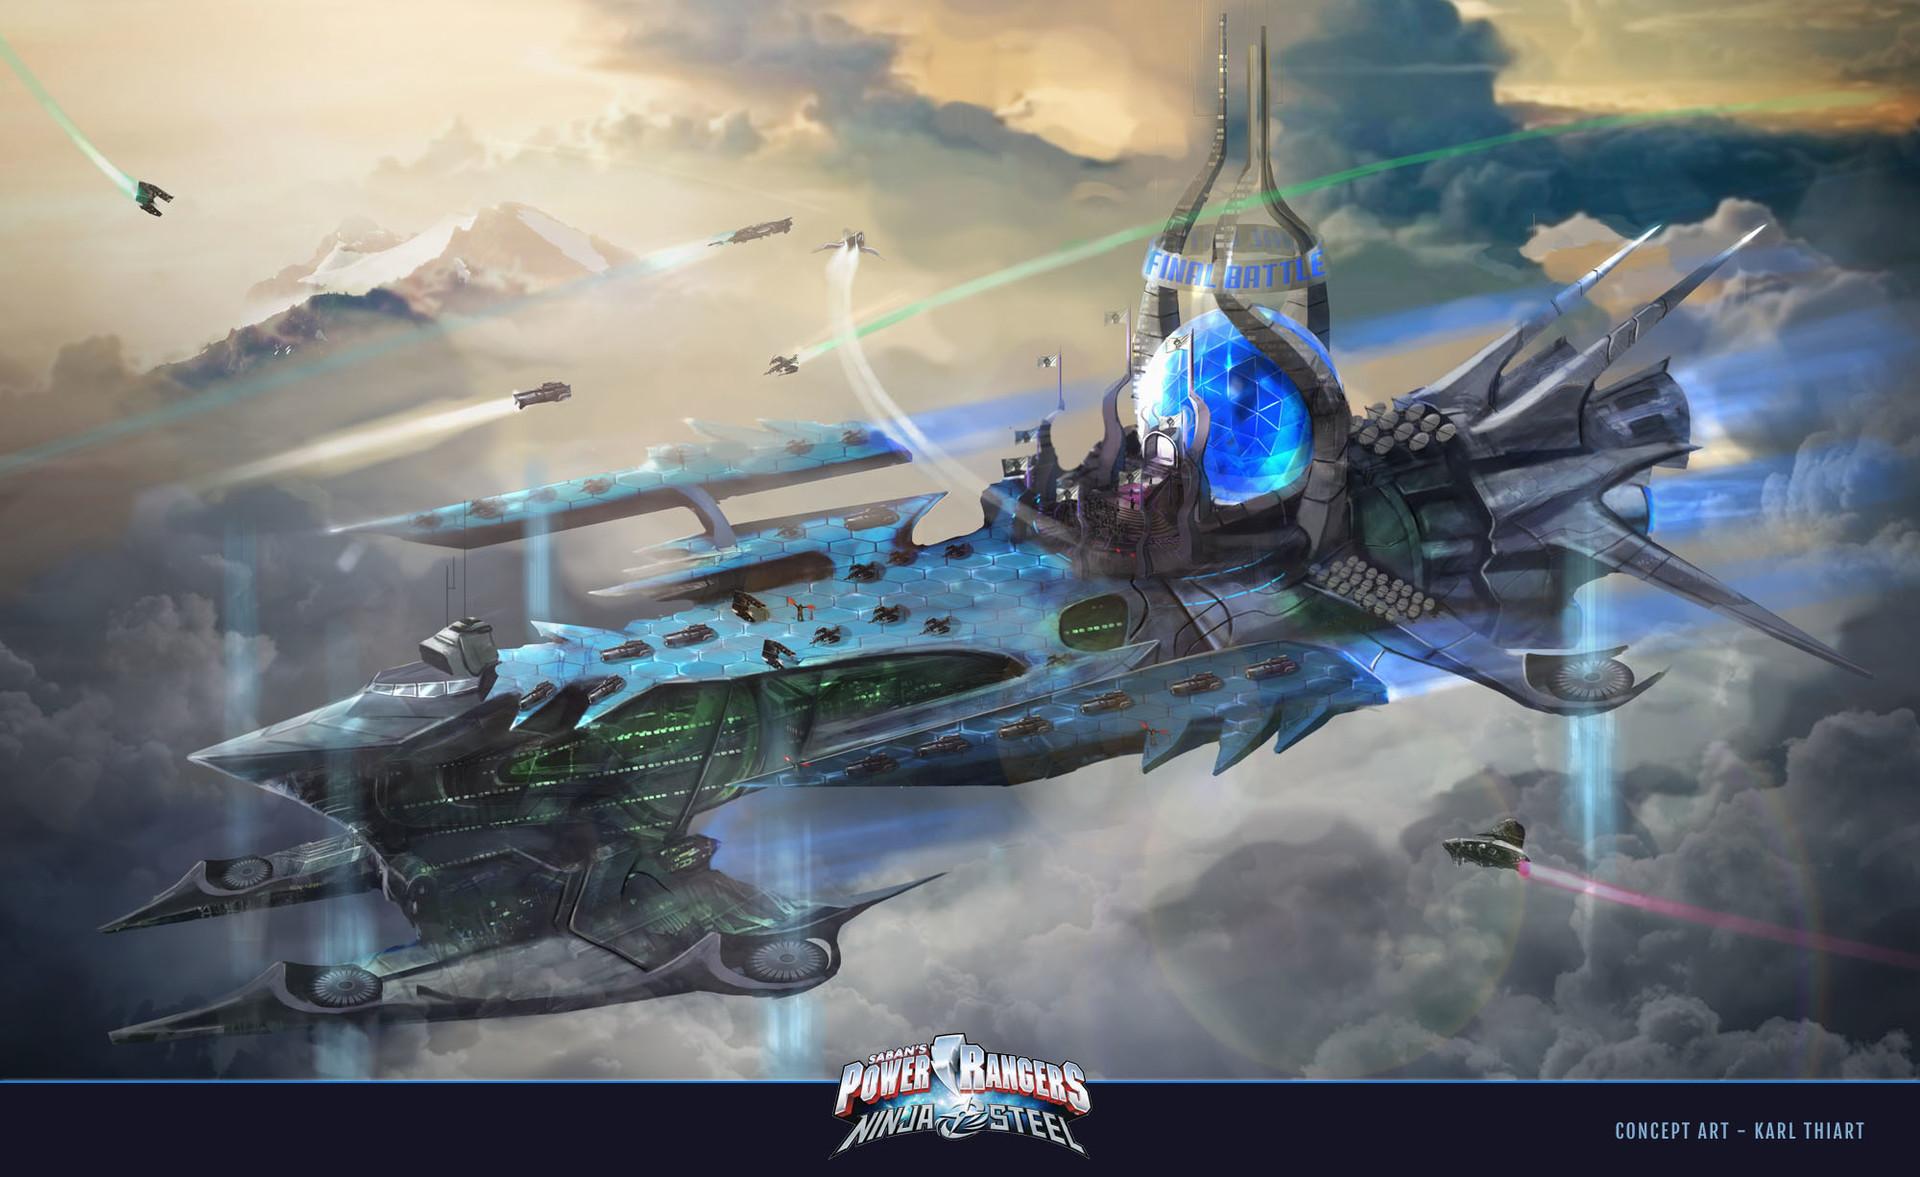 https://cdnb.artstation.com/p/assets/images/images/004/622/071/large/karl-thiart-spaceshipfinal-karlthhiart.jpg?1485072514